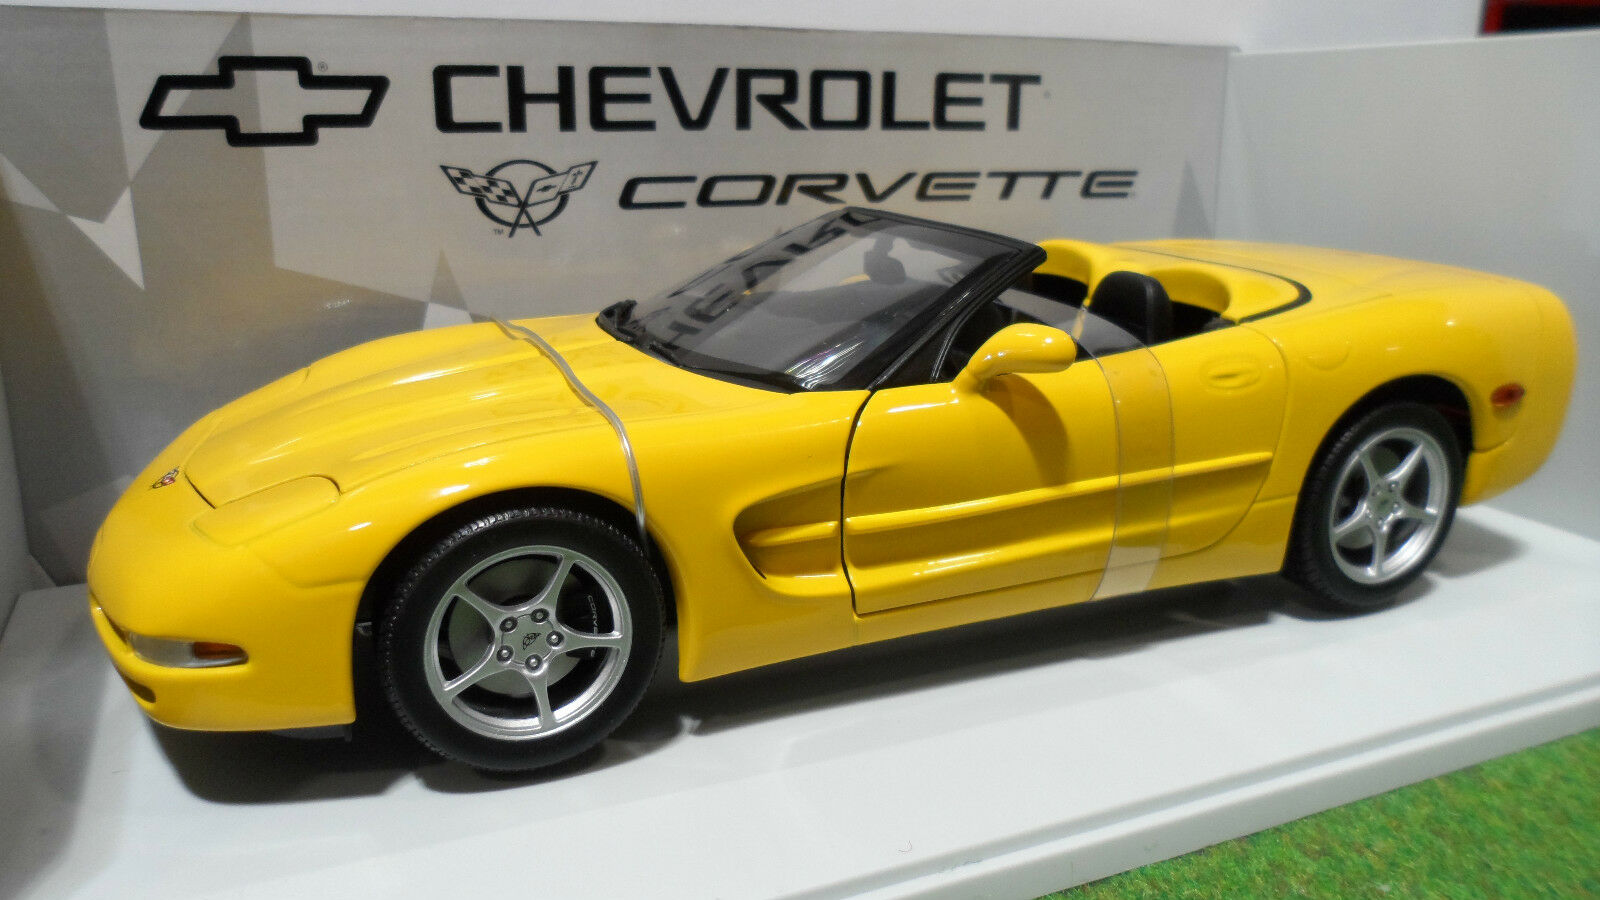 sconto online di vendita CHEVROLET CORVETTE Cabriolet 2000 gituttio 1 18 18 18 d UT modellos 21045 voiture miniature  negozio outlet